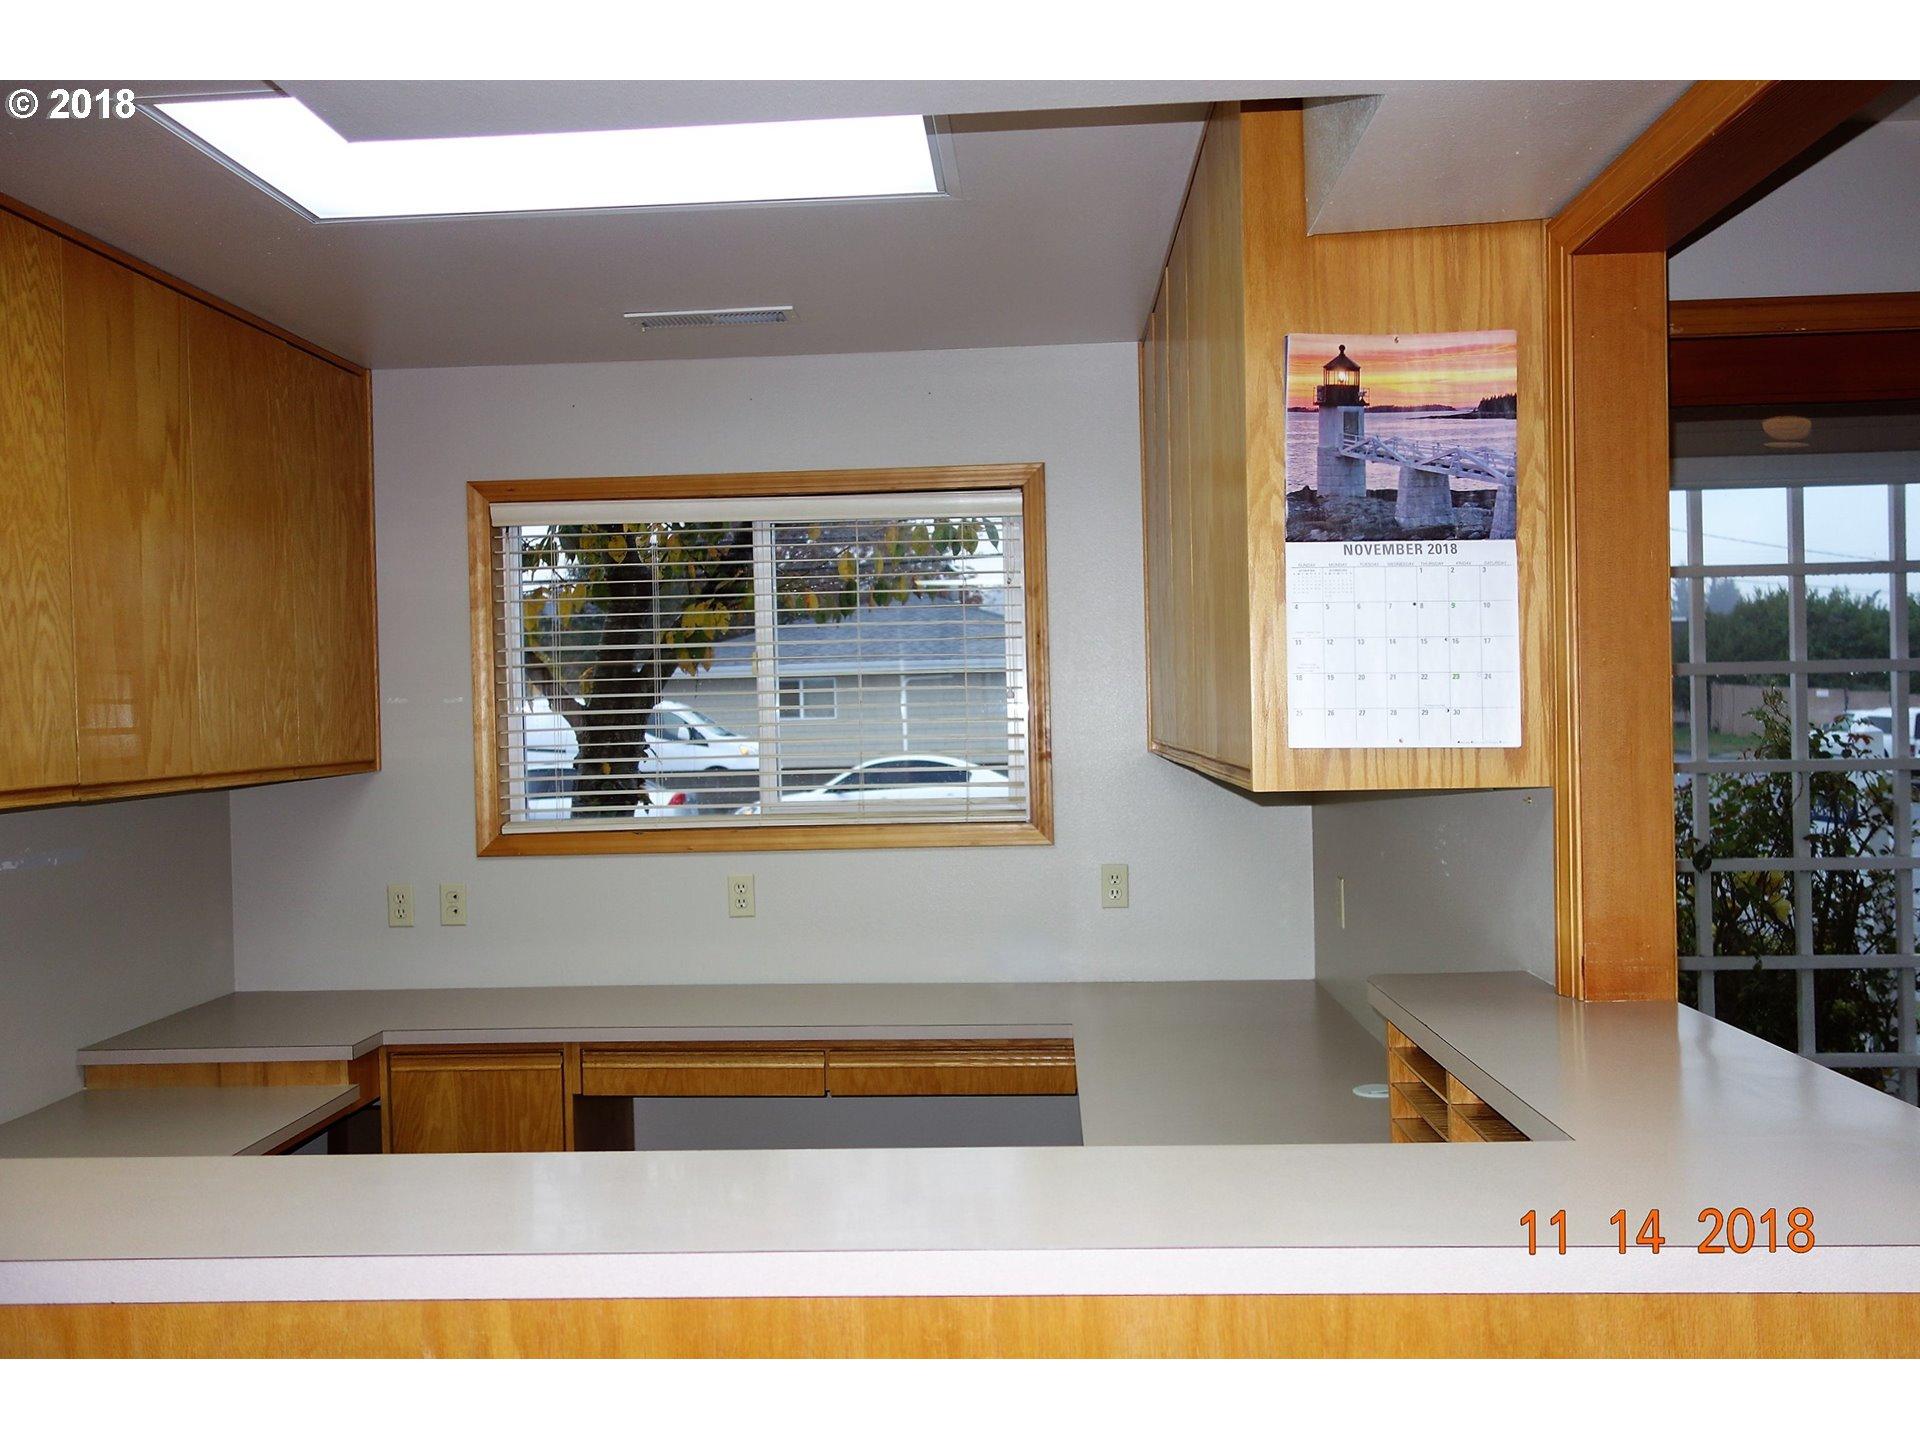 101 NE EADS ST Newport, OR 97365 - MLS #: 18621553